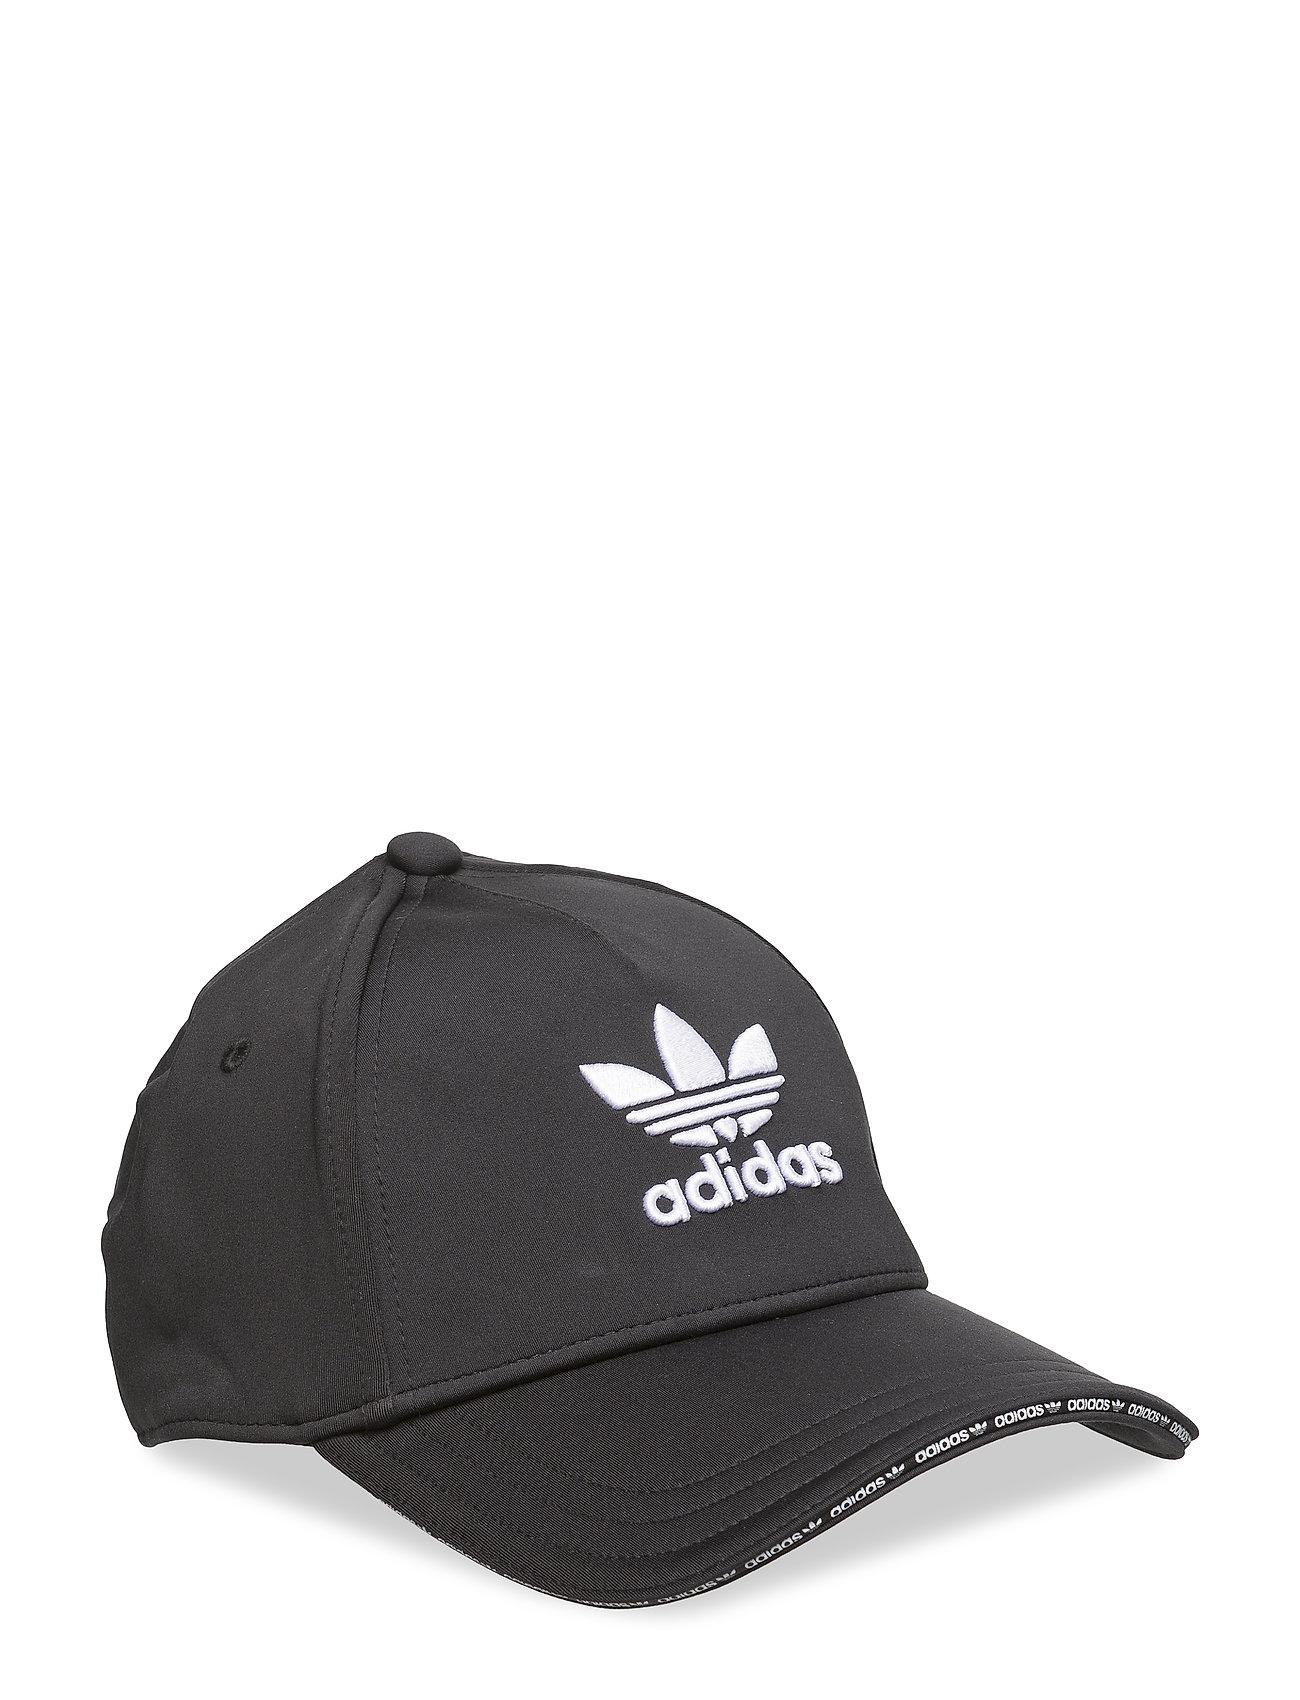 67e0f1be84b28 adidas Originals Cap (Black/white), (13 €) | Large selection of ...